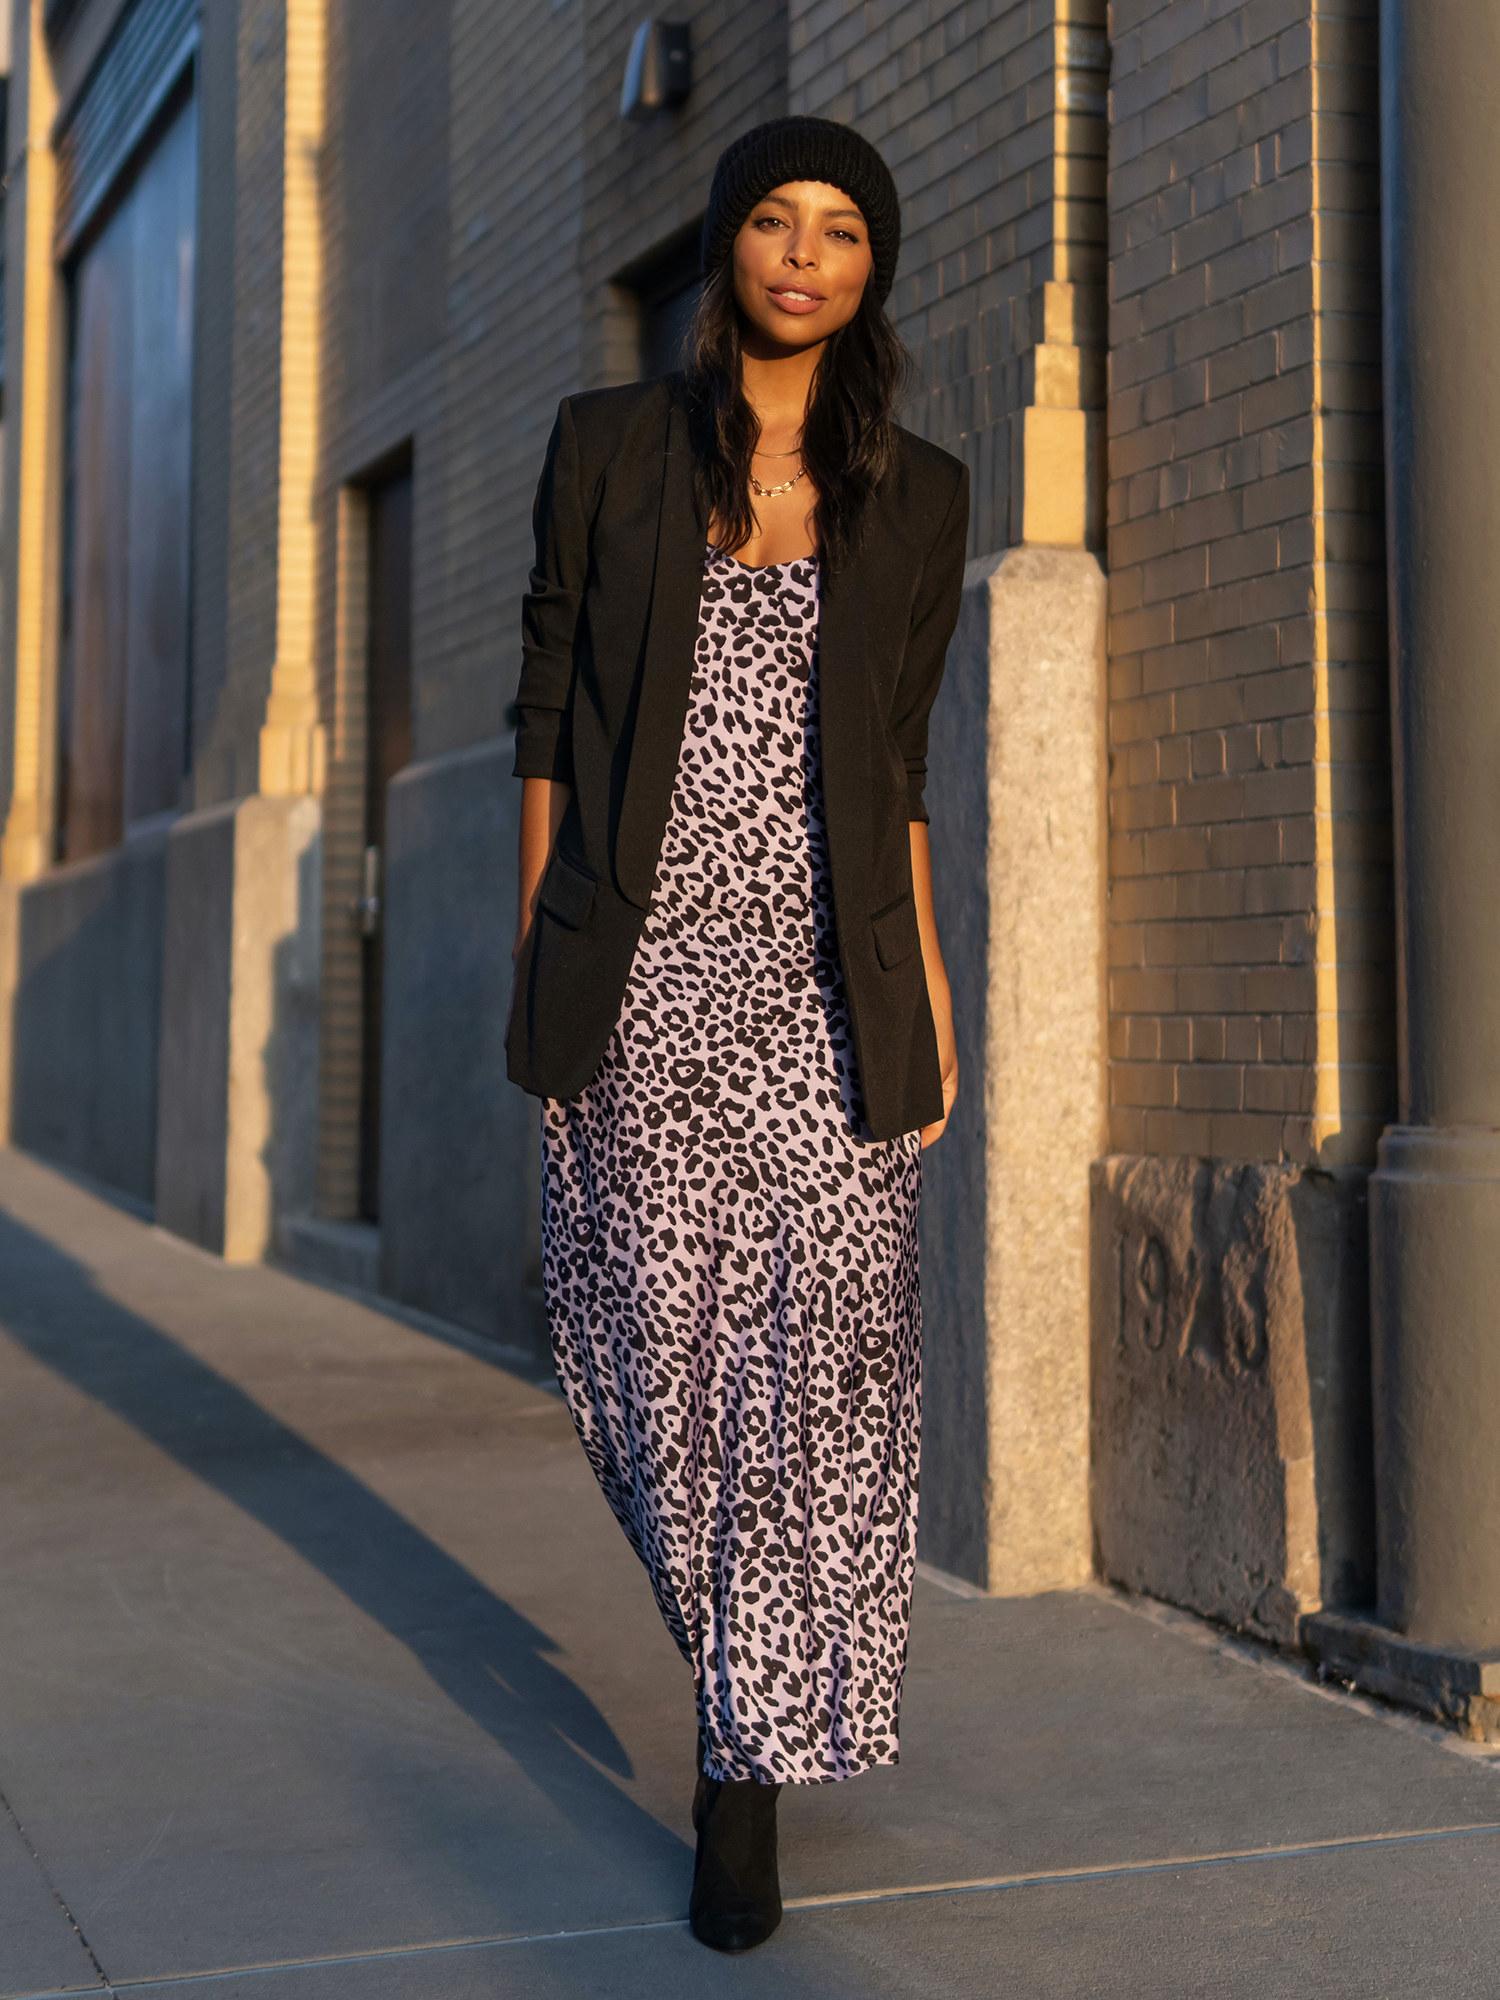 A model posing outside wearing the blazer over a dress